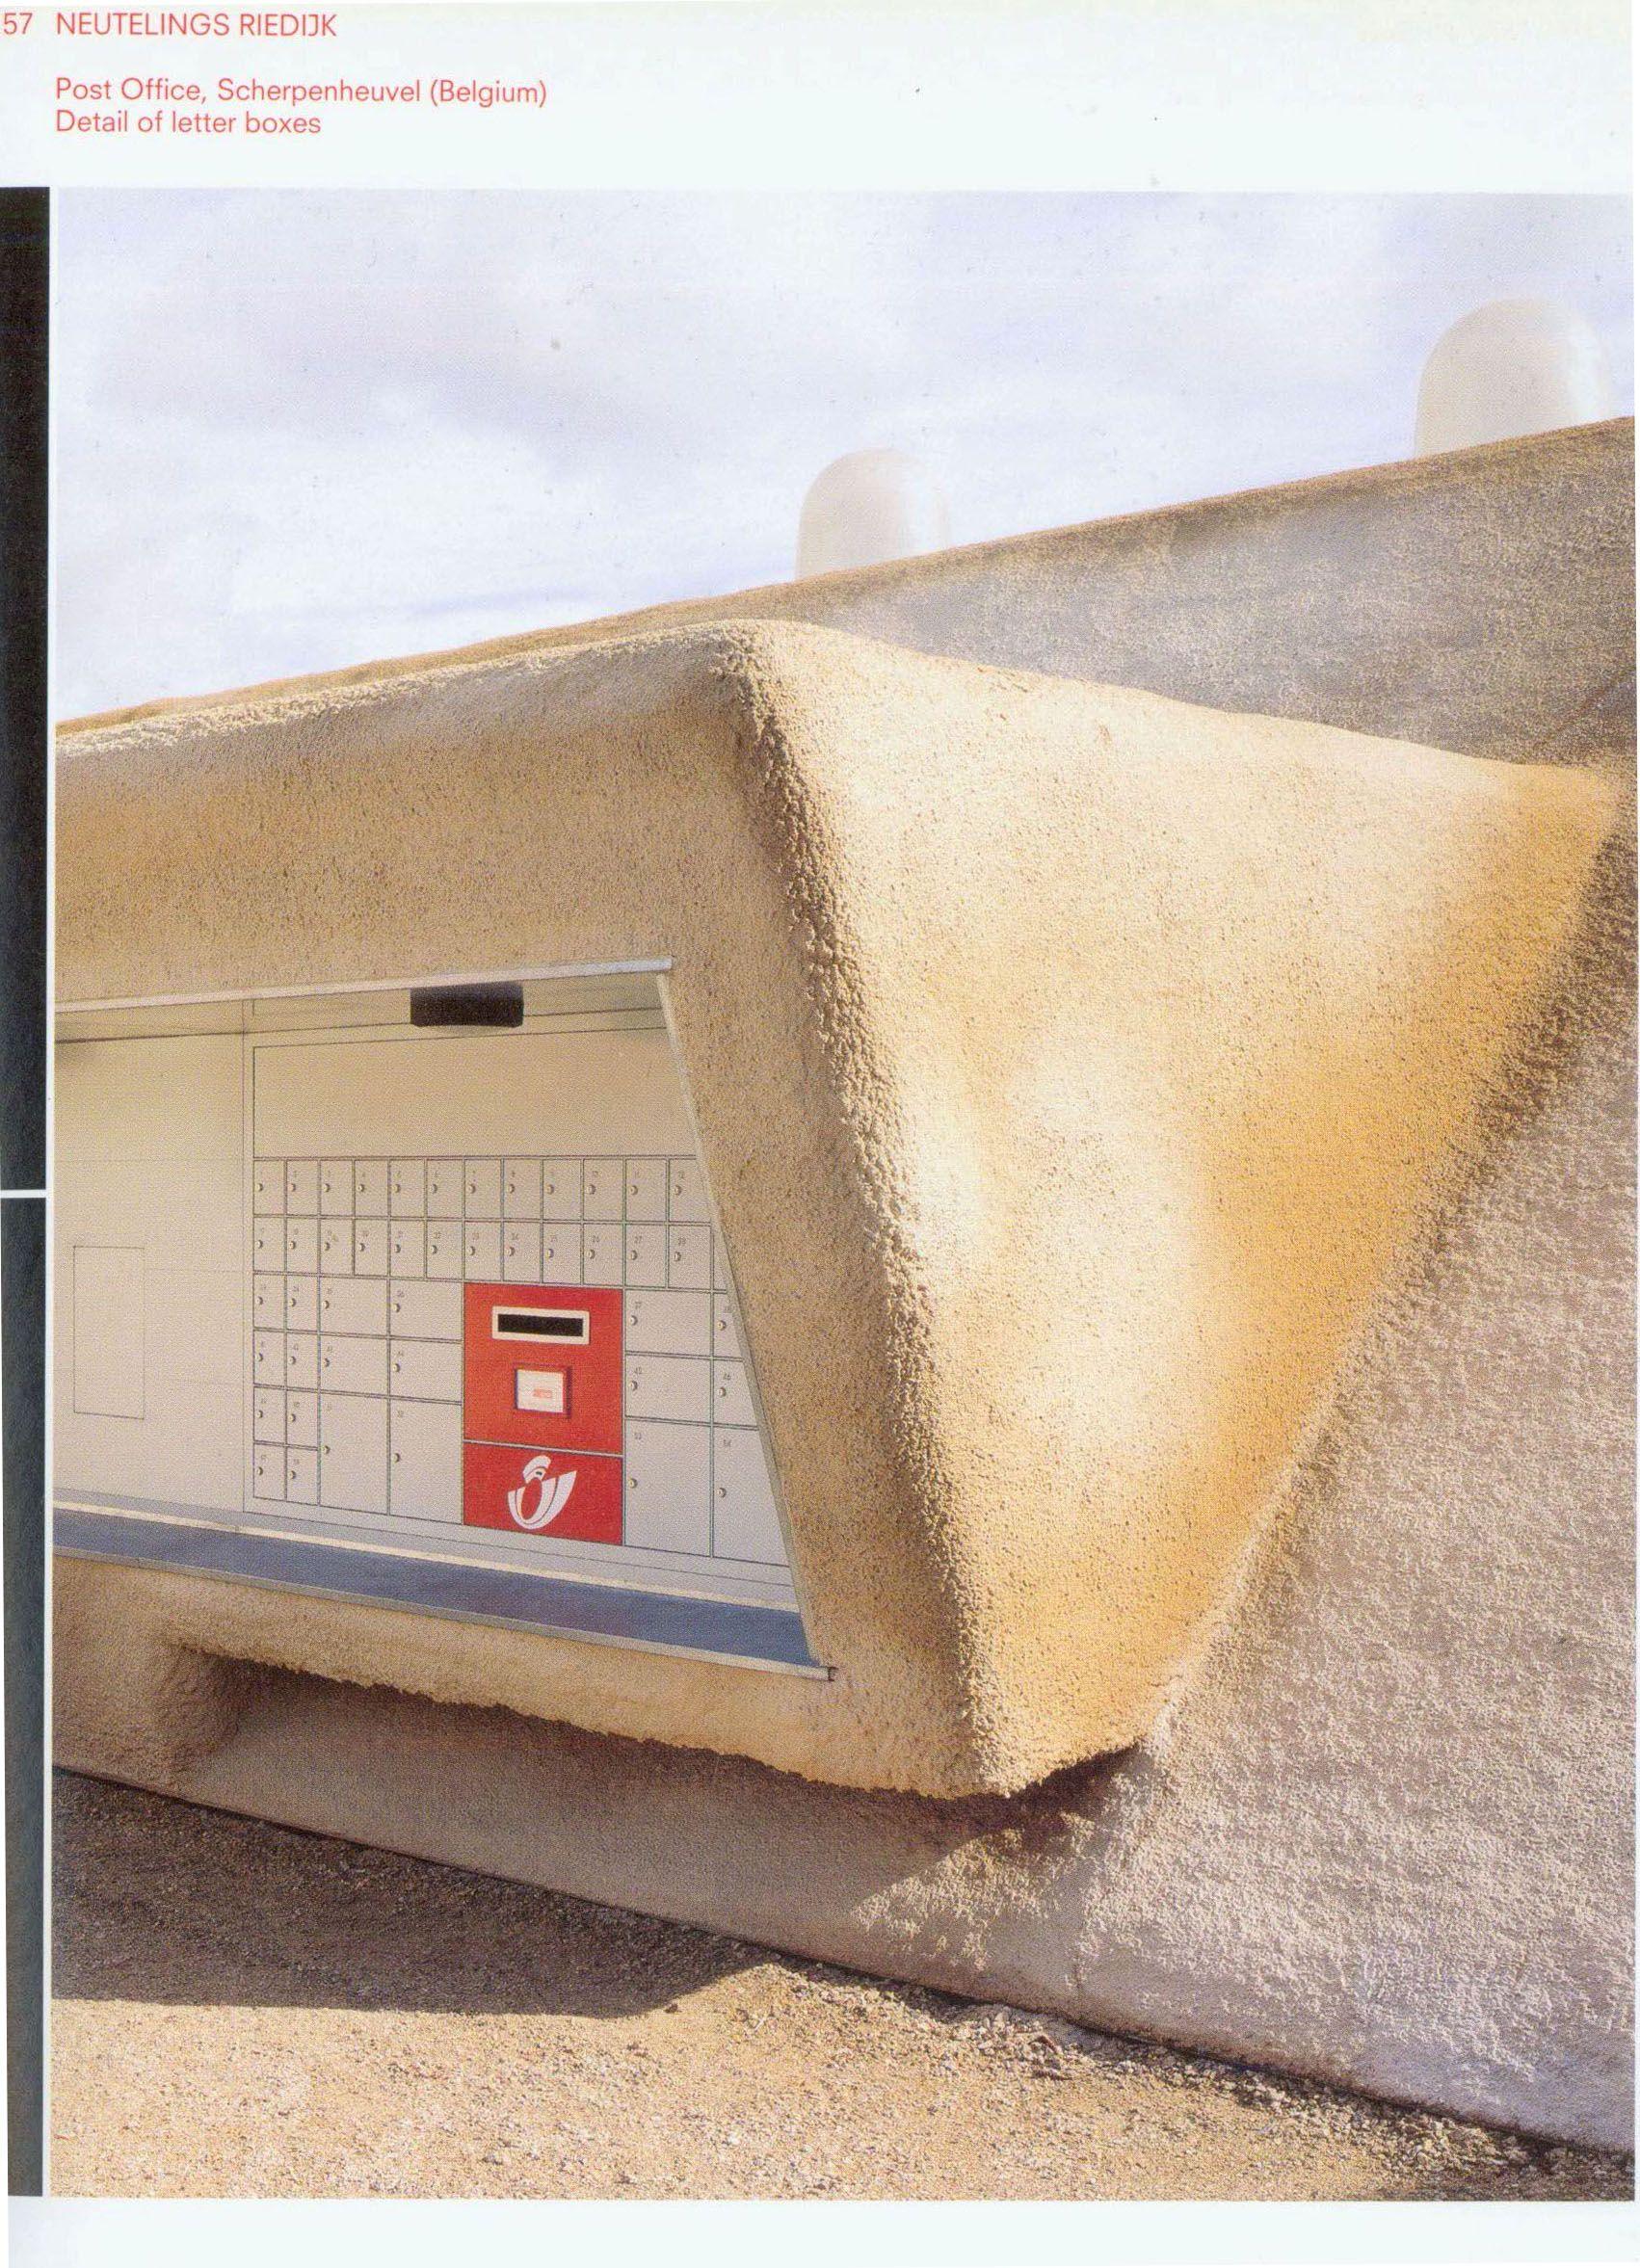 Neutelings Riedijk Post Office Scherpenheuvel Belgium Post Office Belgium Architecture